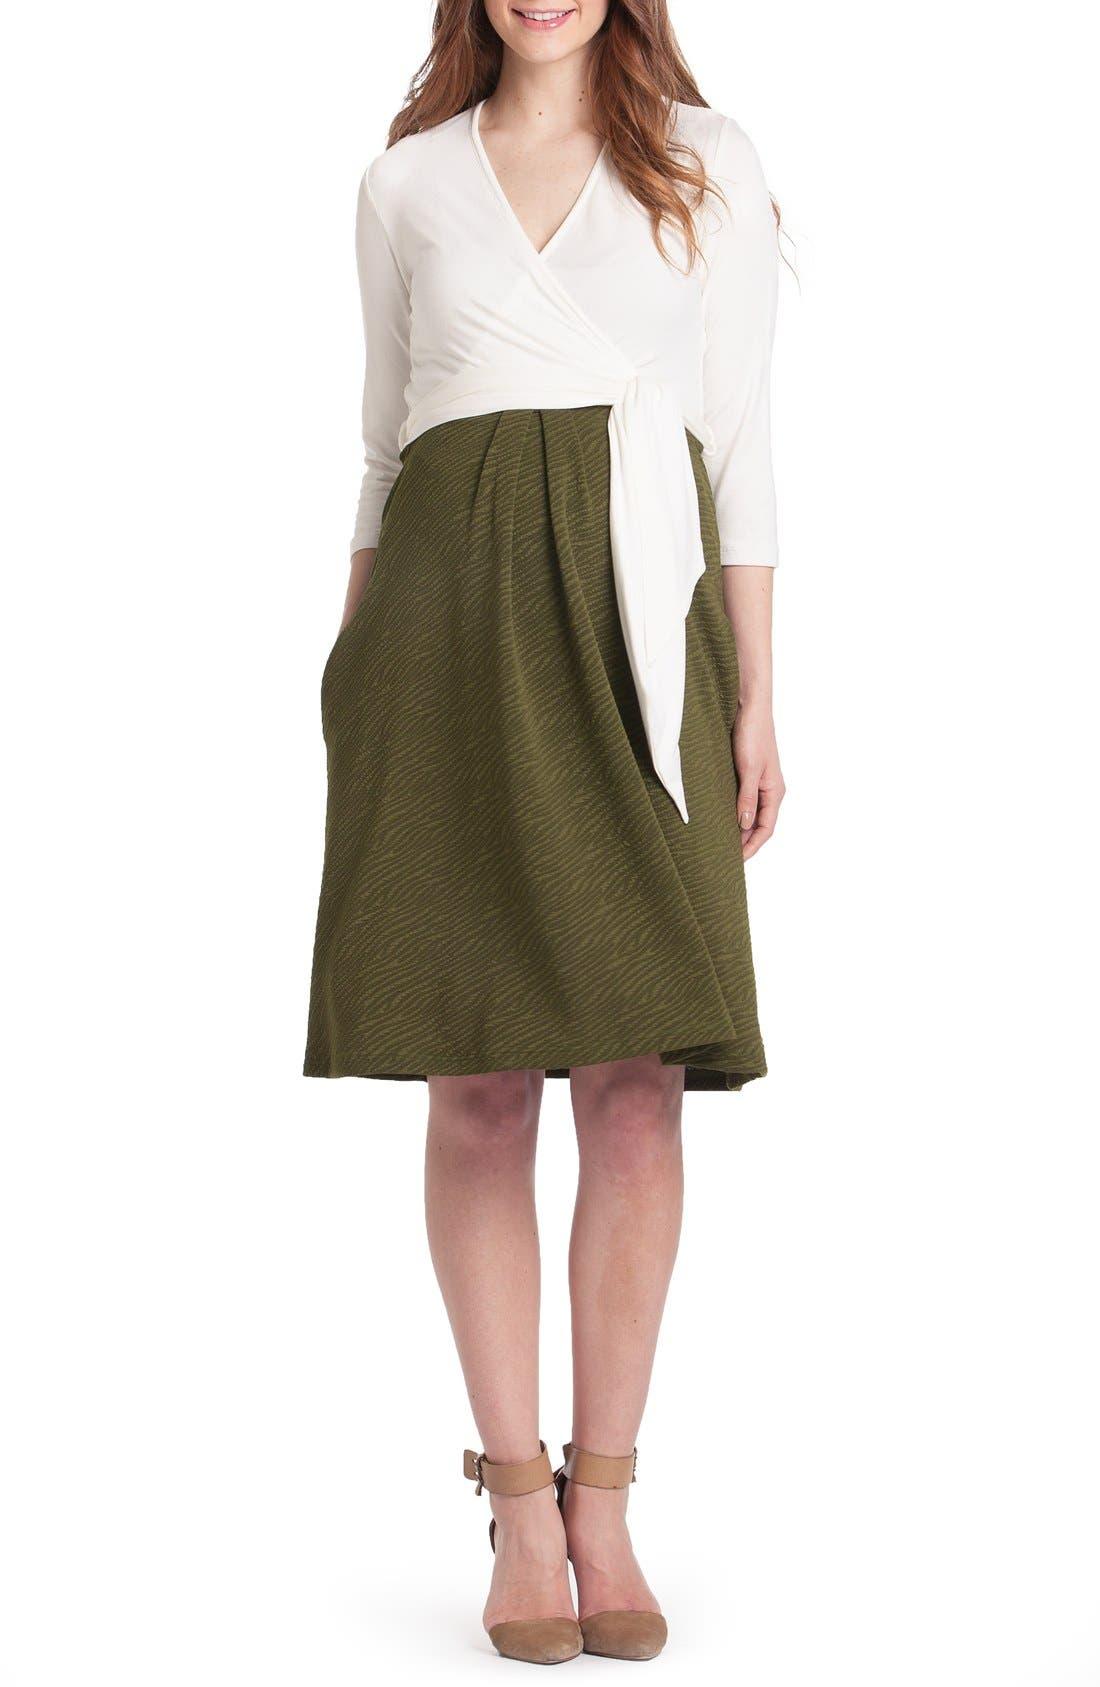 Alternate Image 1 Selected - Lilac Clothing Abby Maternity/Nursing Dress